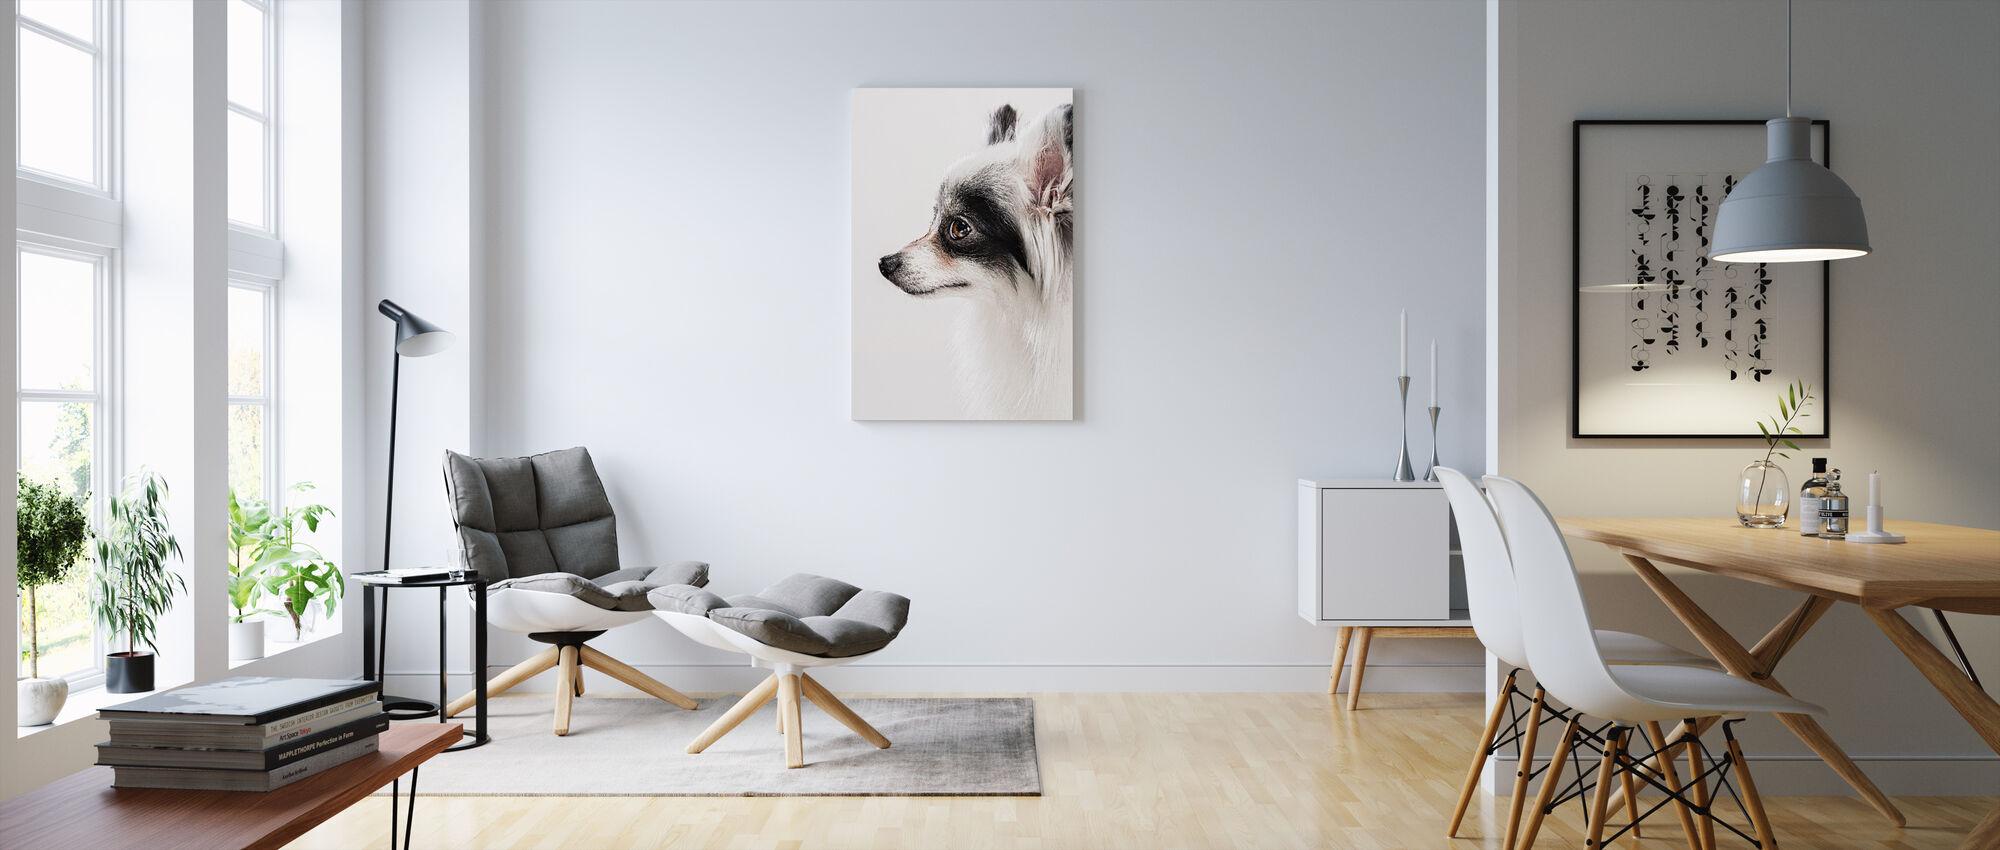 Pomeranian Dog - Canvas print - Living Room